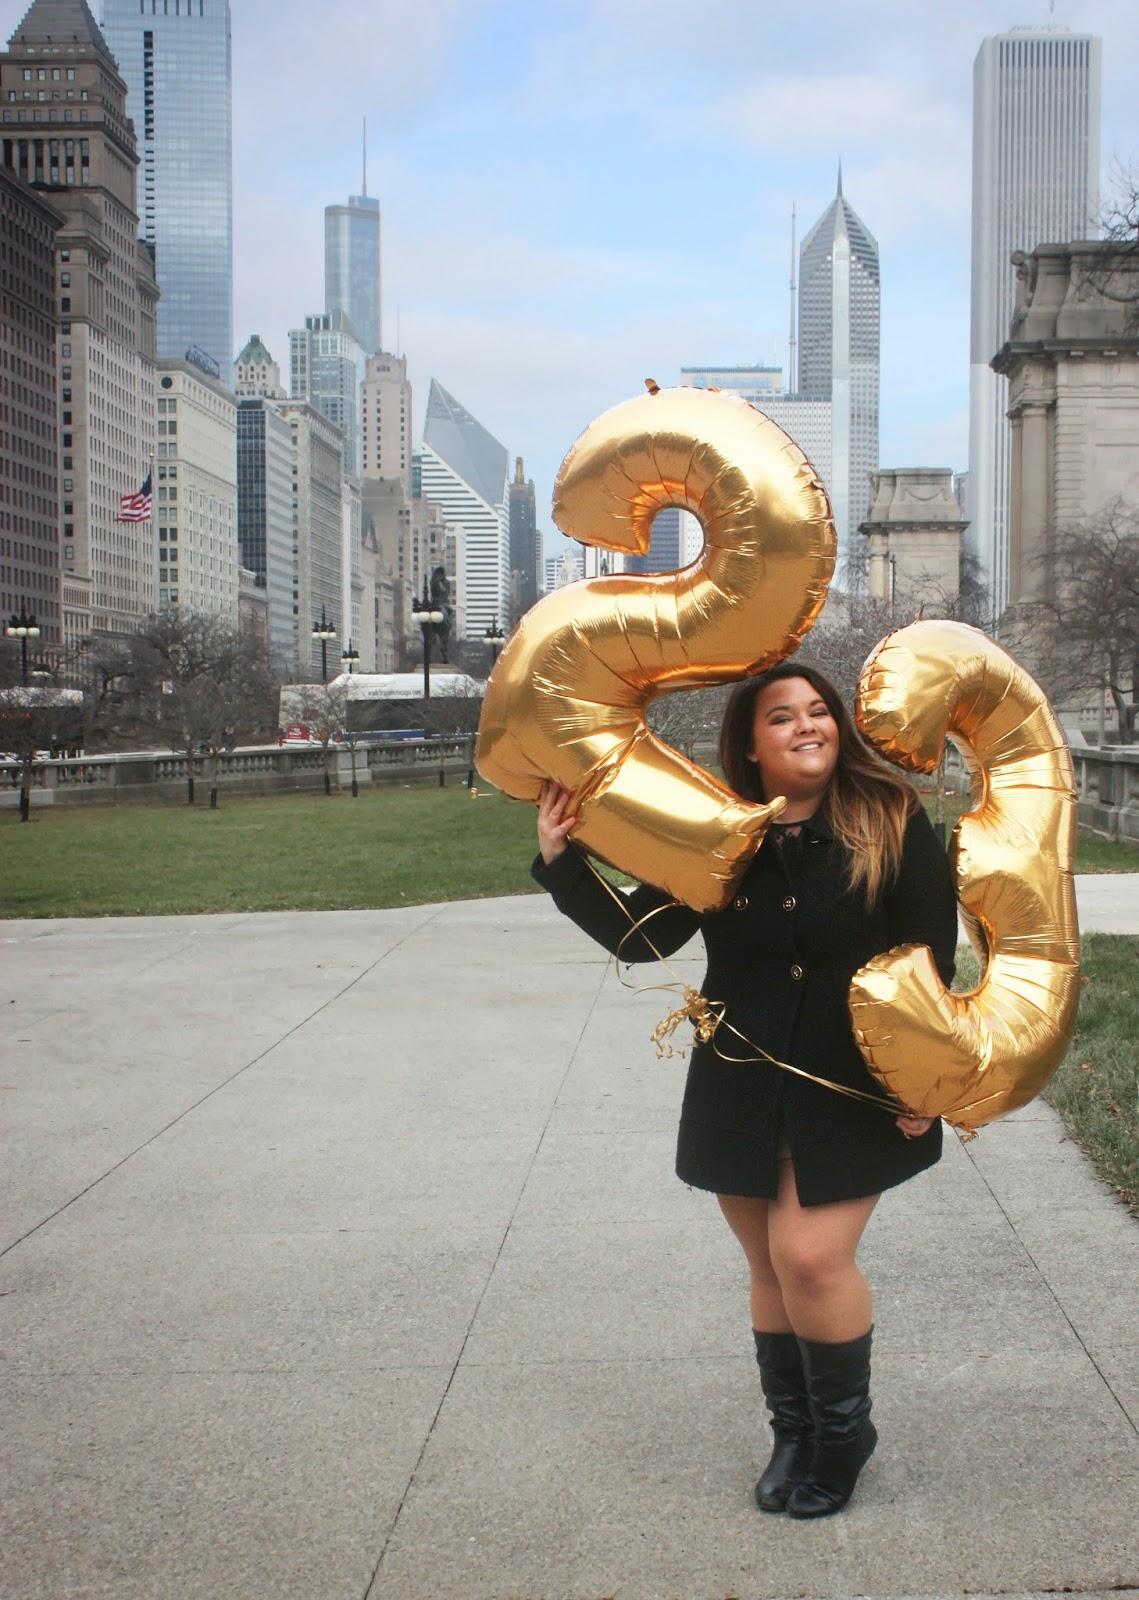 Fatshion Fashion Blogger Fat Girl Happy Birthday Gold Number Balloons